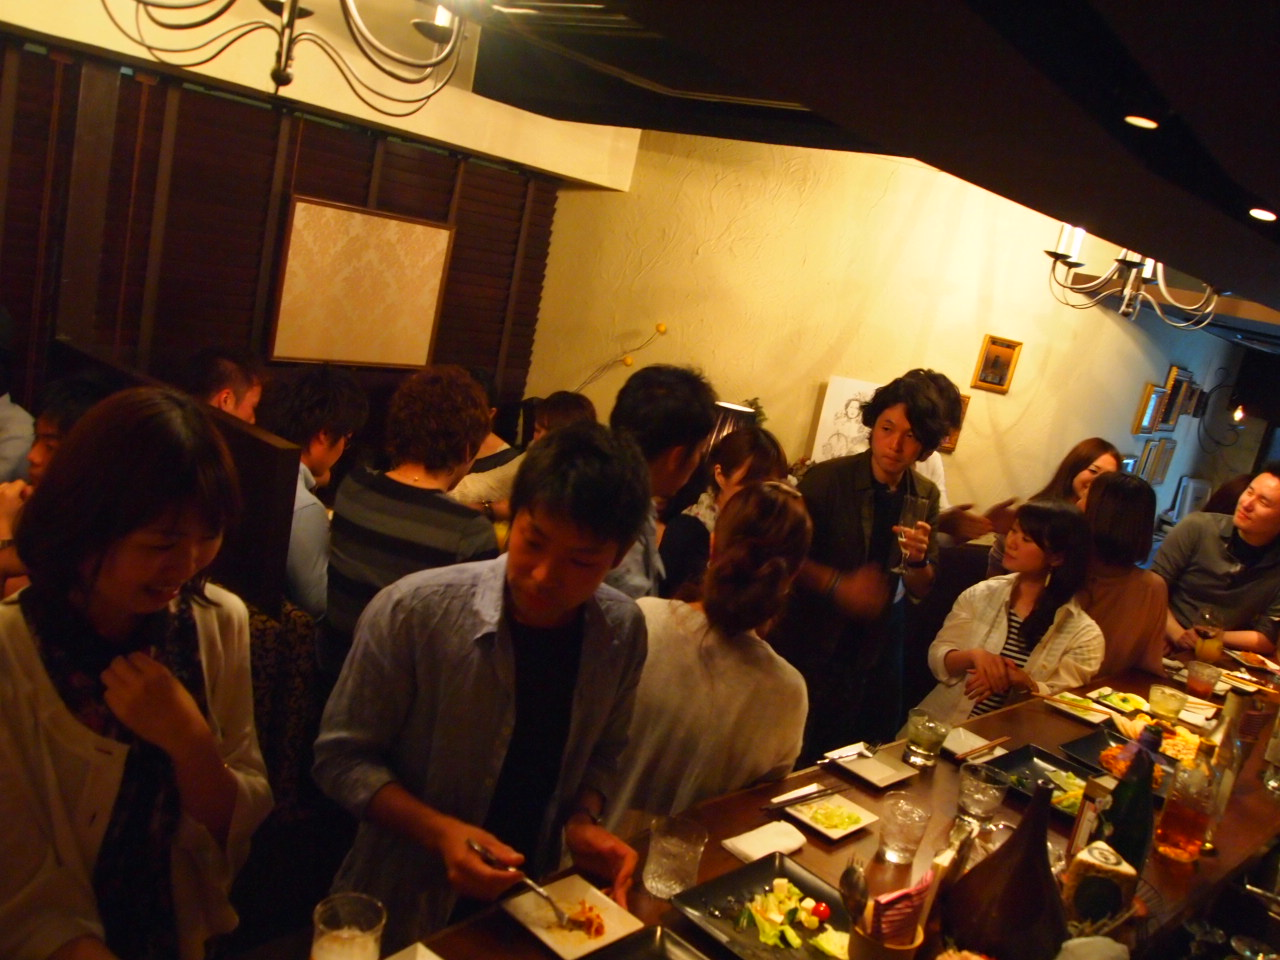 miumiu第69回大コンパ大会・若者部。_a0050302_0263115.jpg